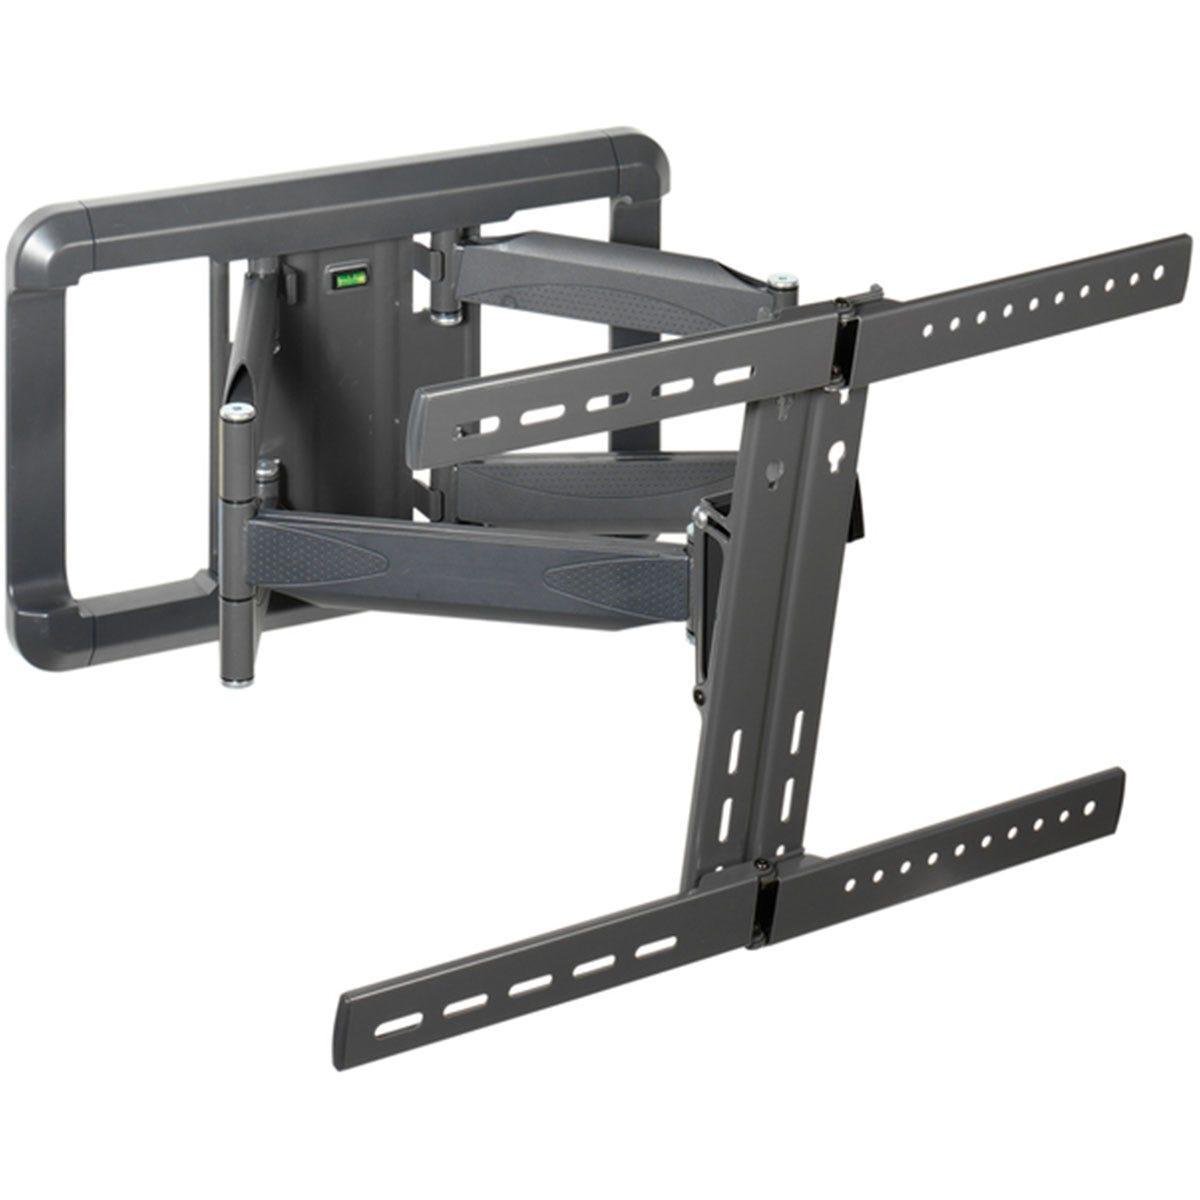 Vivanco BFMO 8560 Titan XXL Full Motion TV Wallmount 85